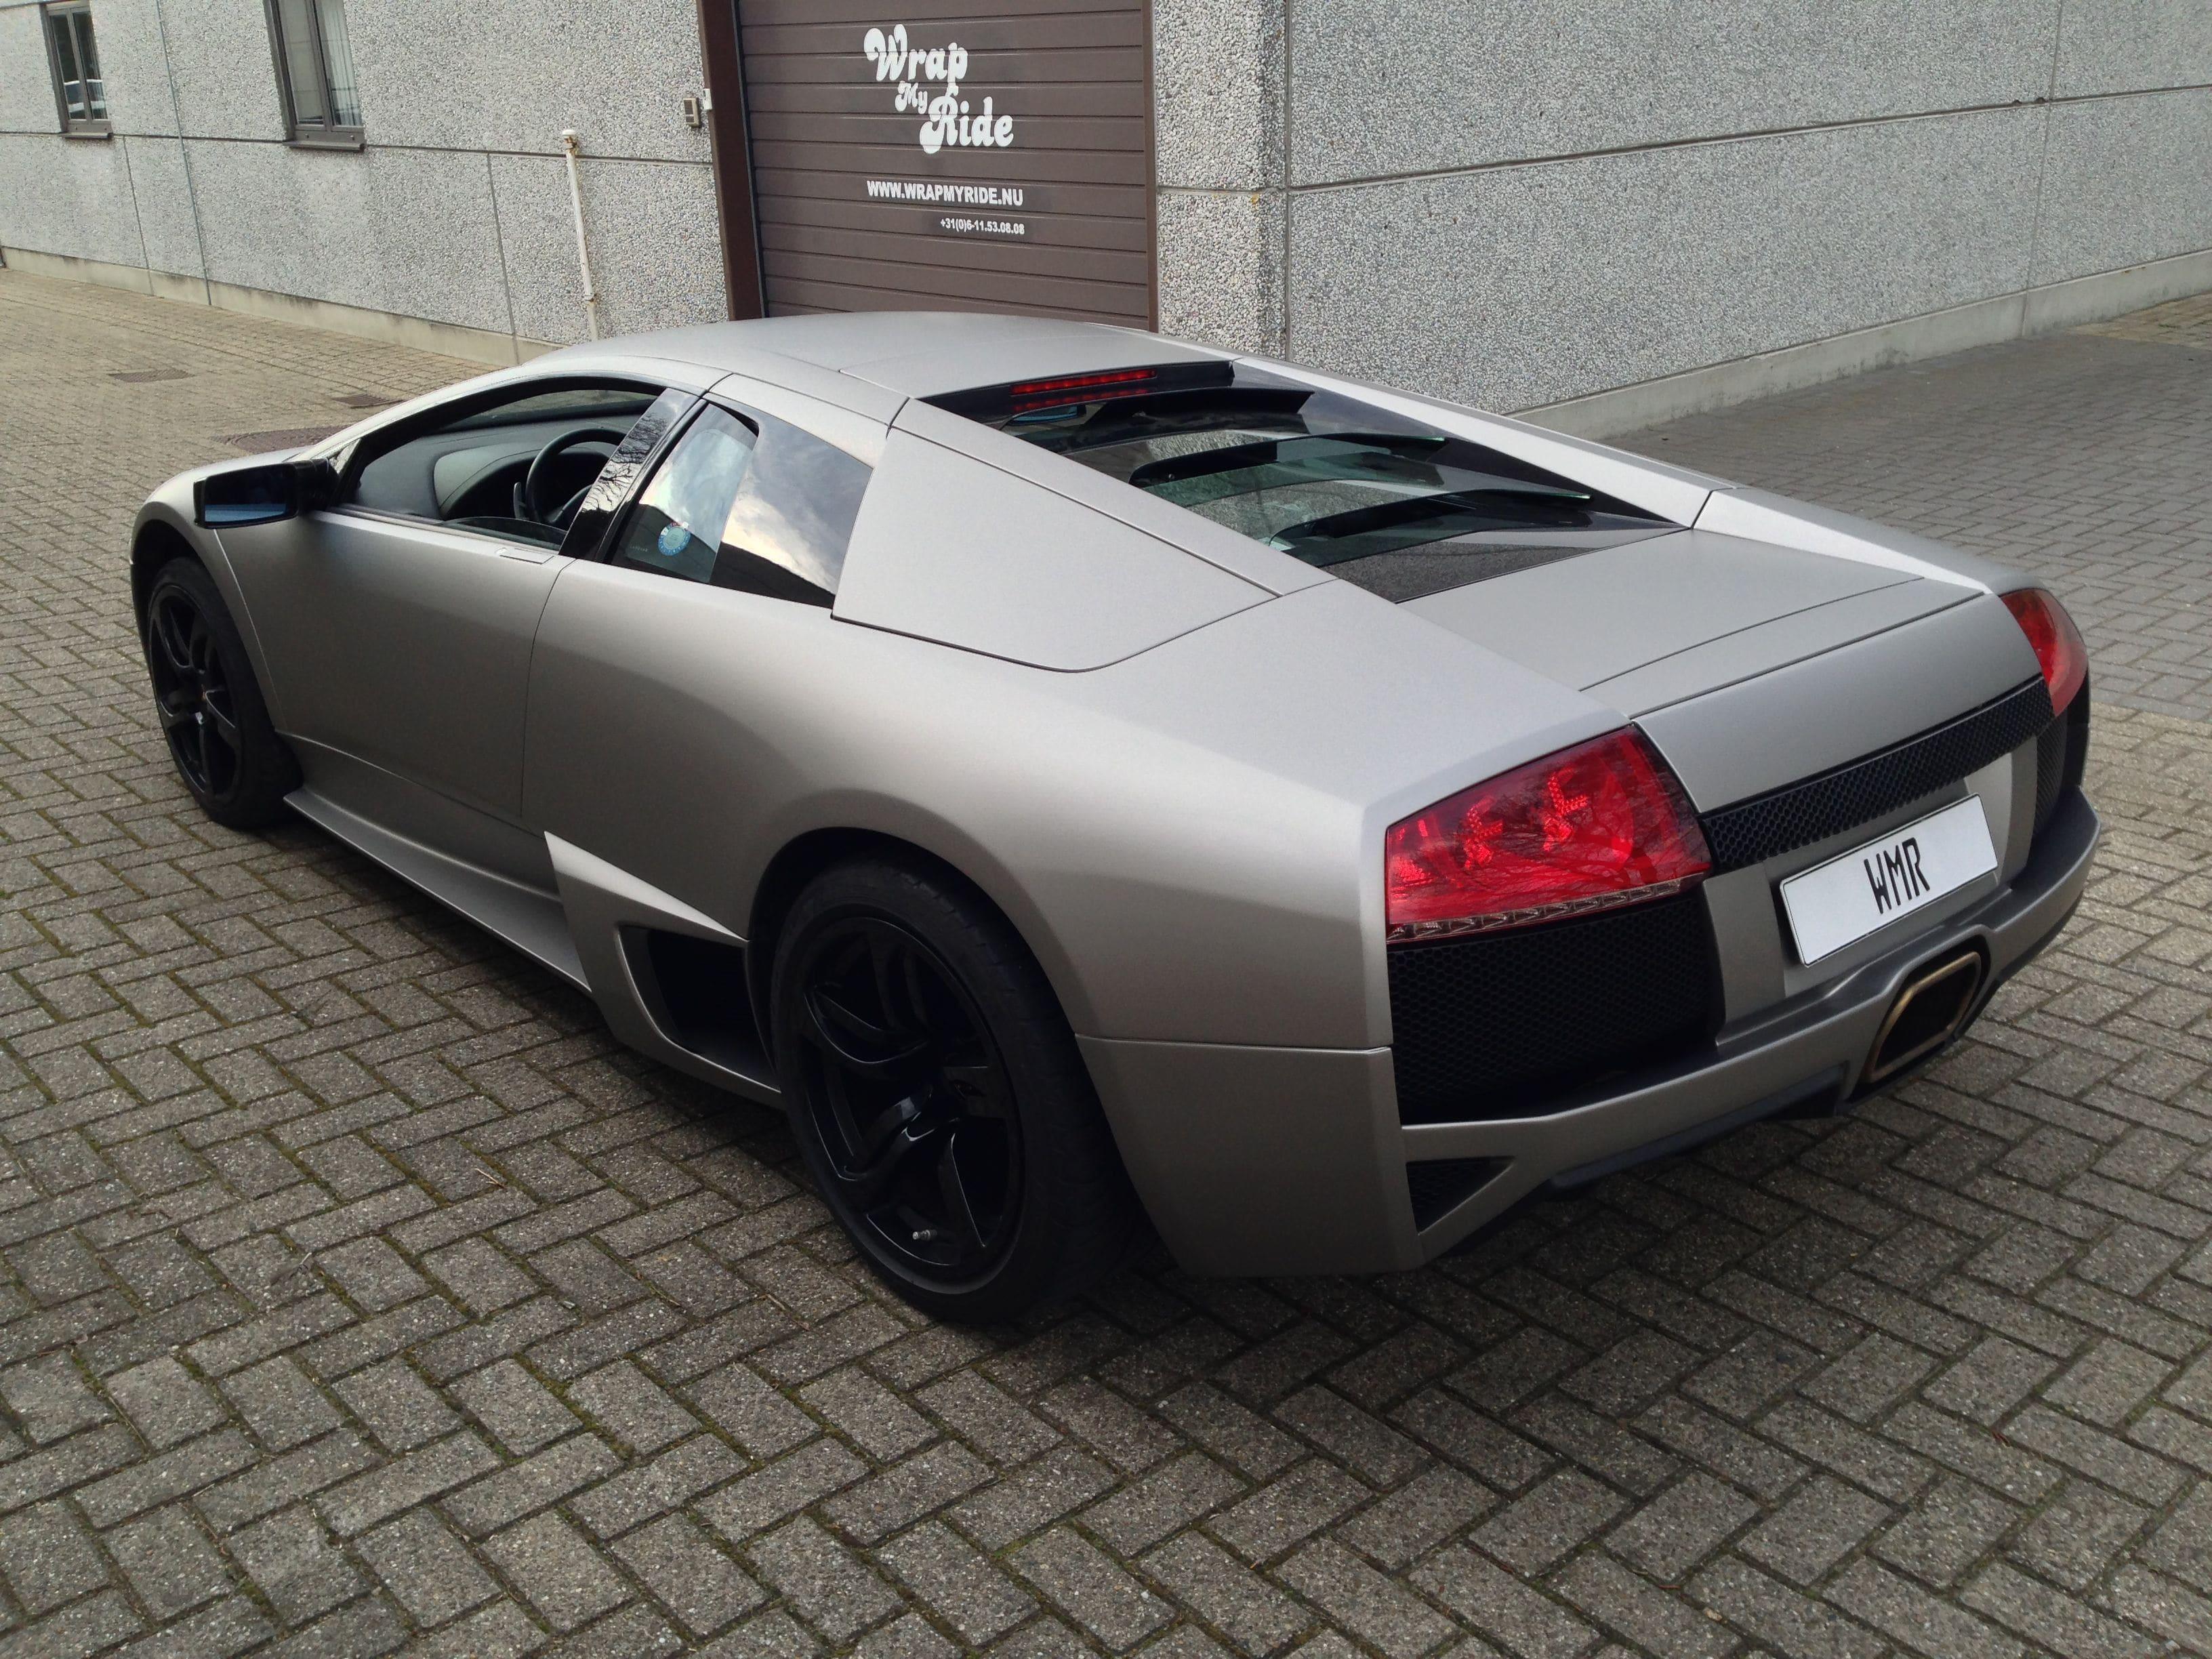 Lamborghini Murcialago LP670 met Gunpowder Wrap, Carwrapping door Wrapmyride.nu Foto-nr:5982, ©2021